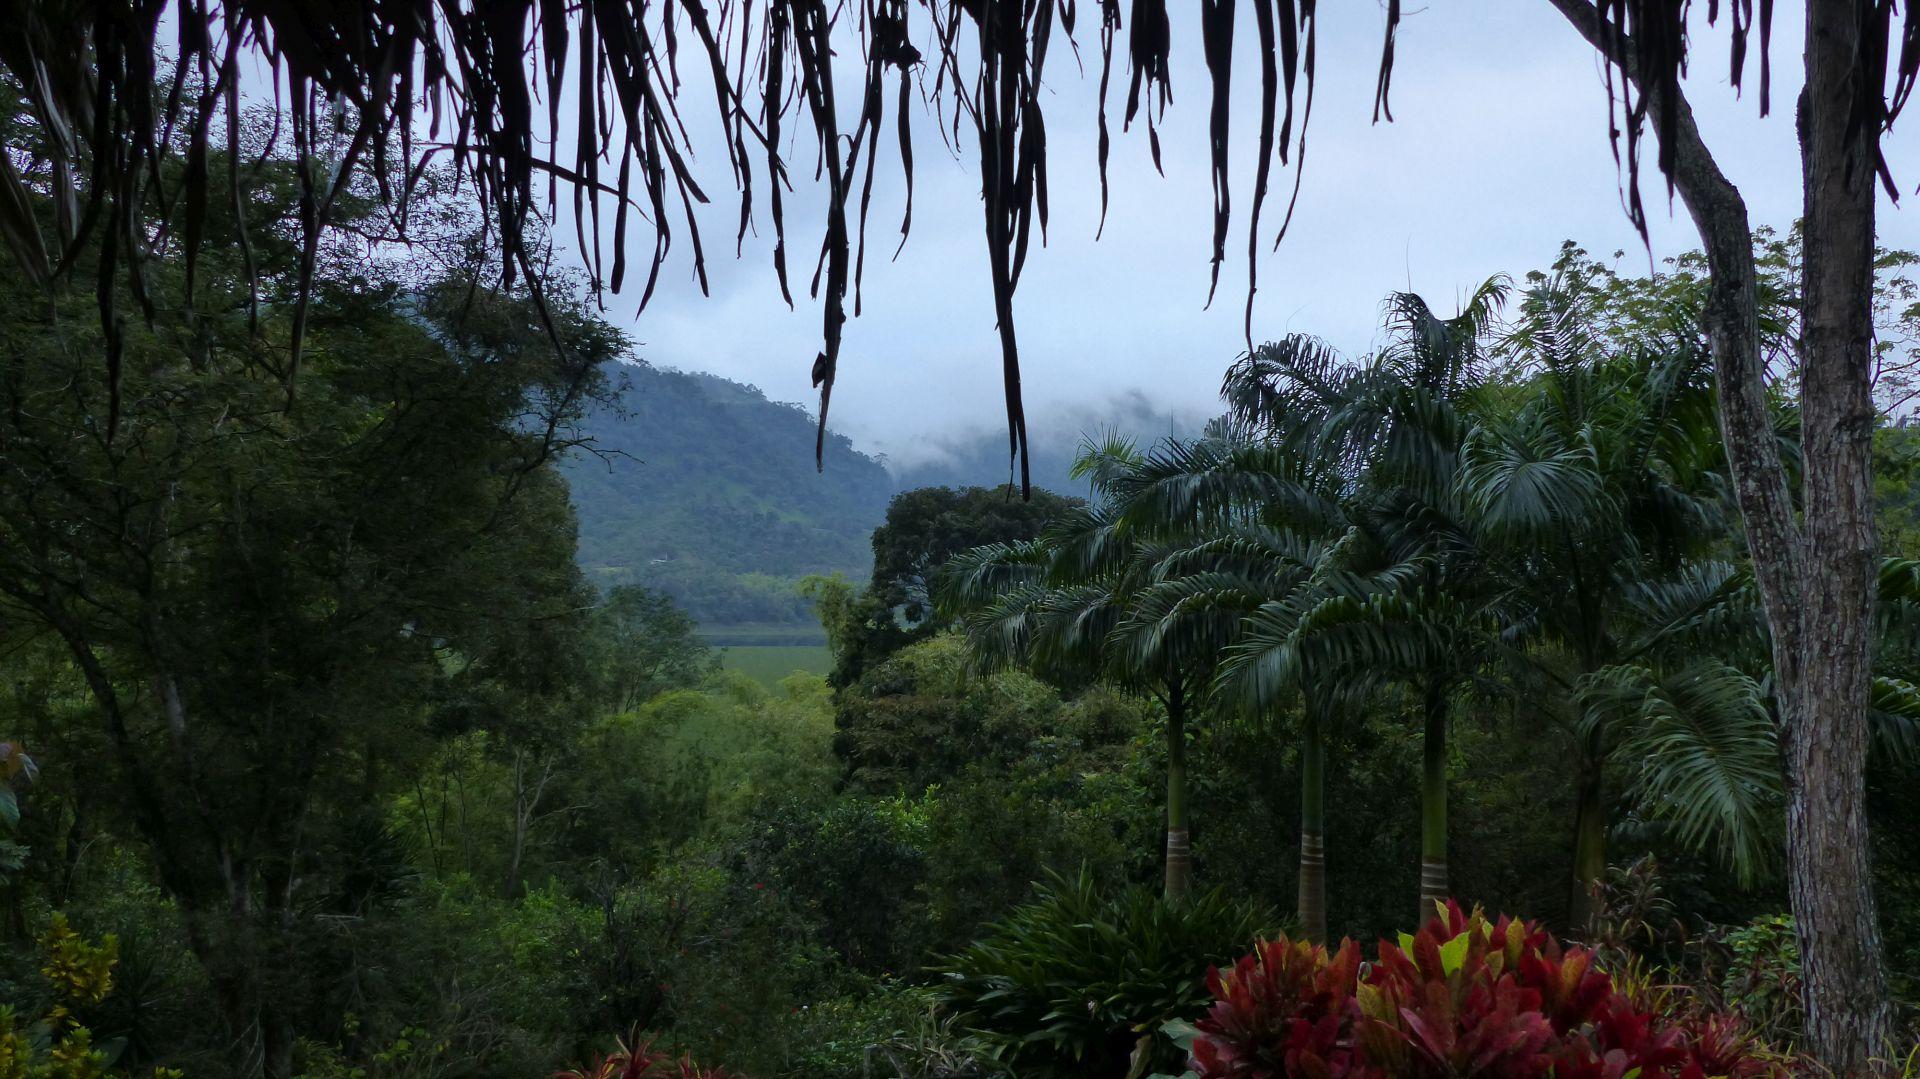 P1370557 morning view